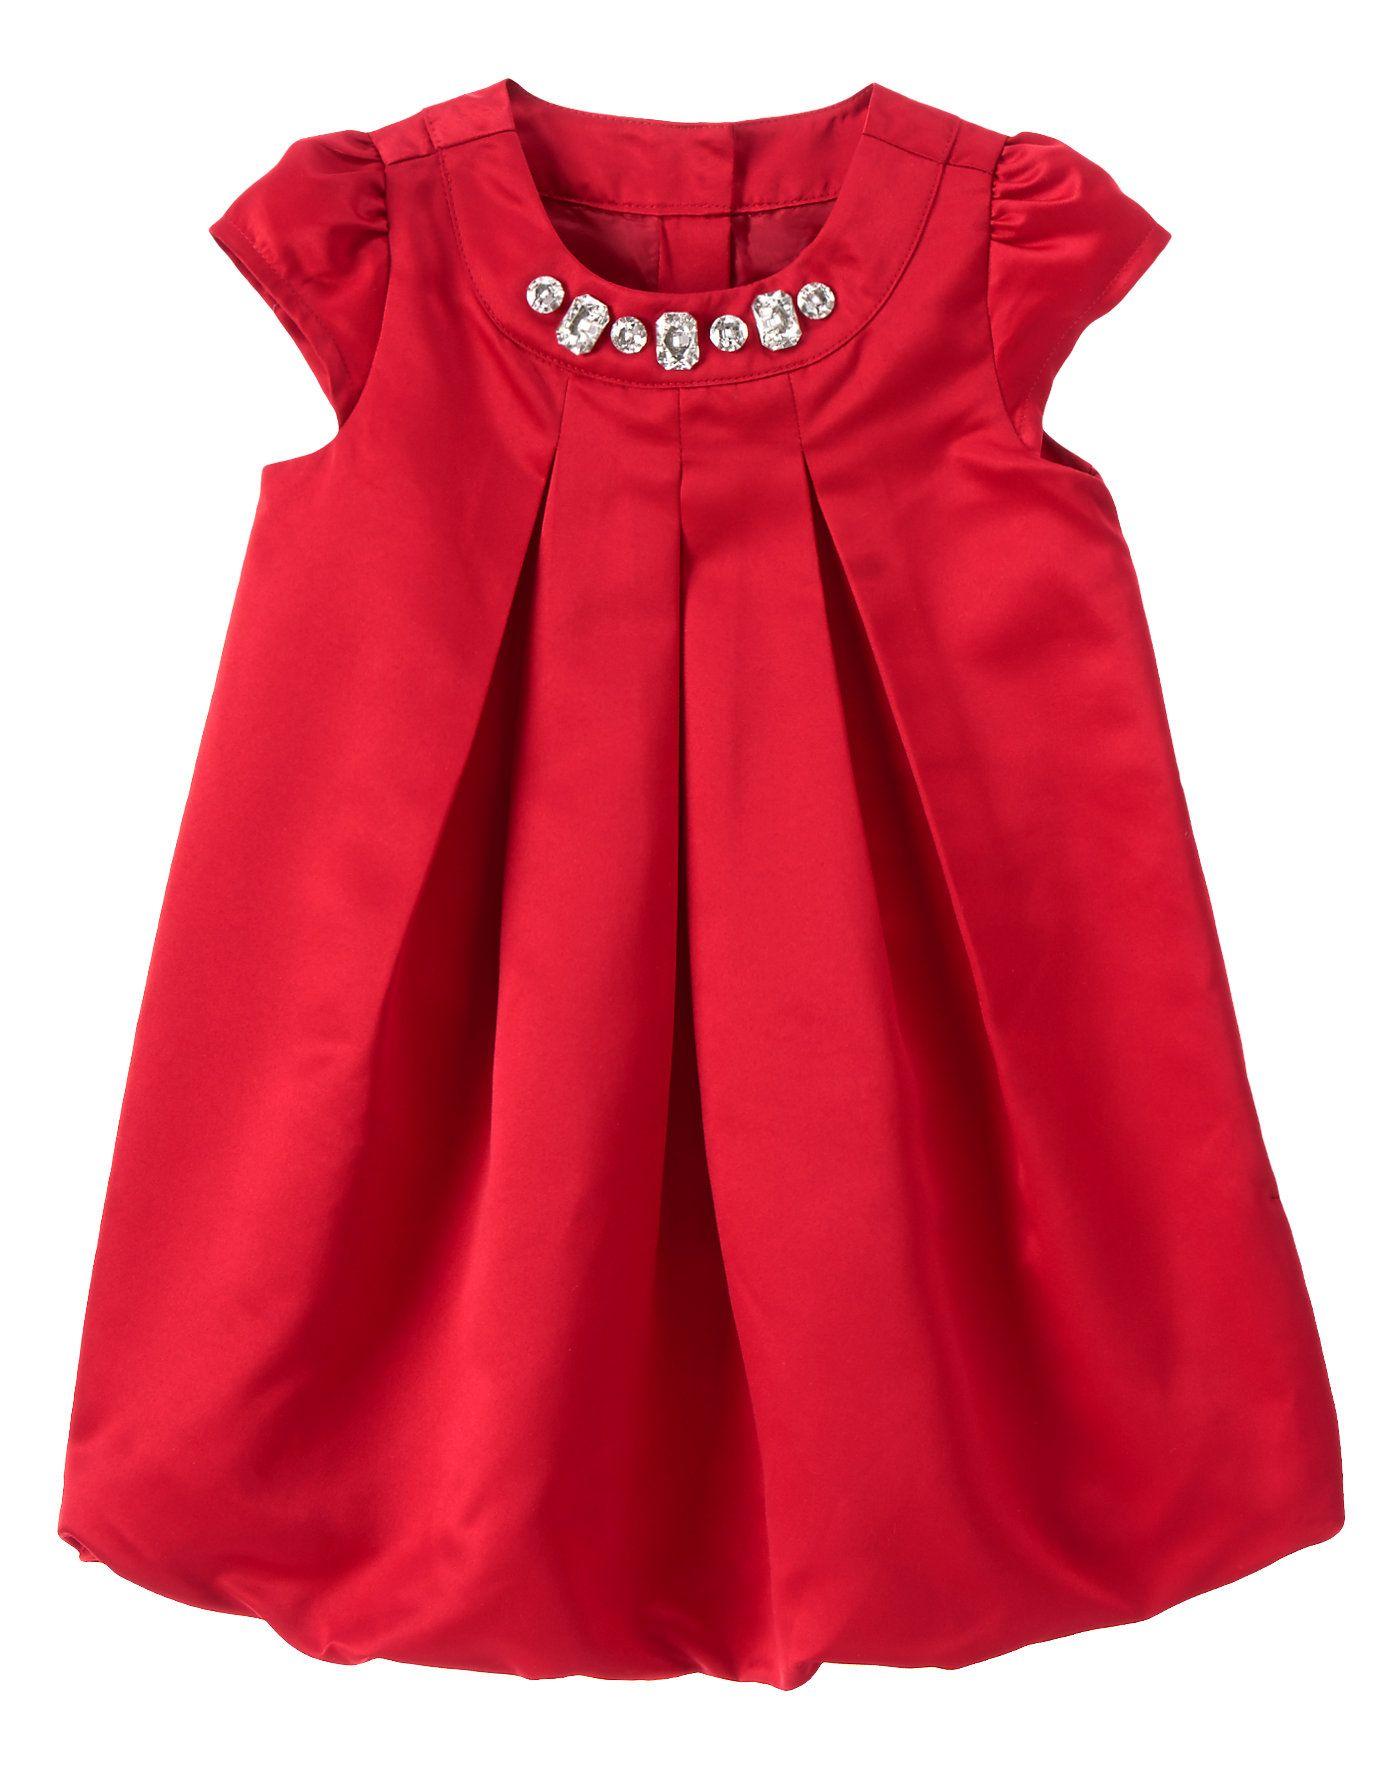 fc90bfe9bab Toddler Girl Christmas Dresses Gymboree - Gomes Weine AG